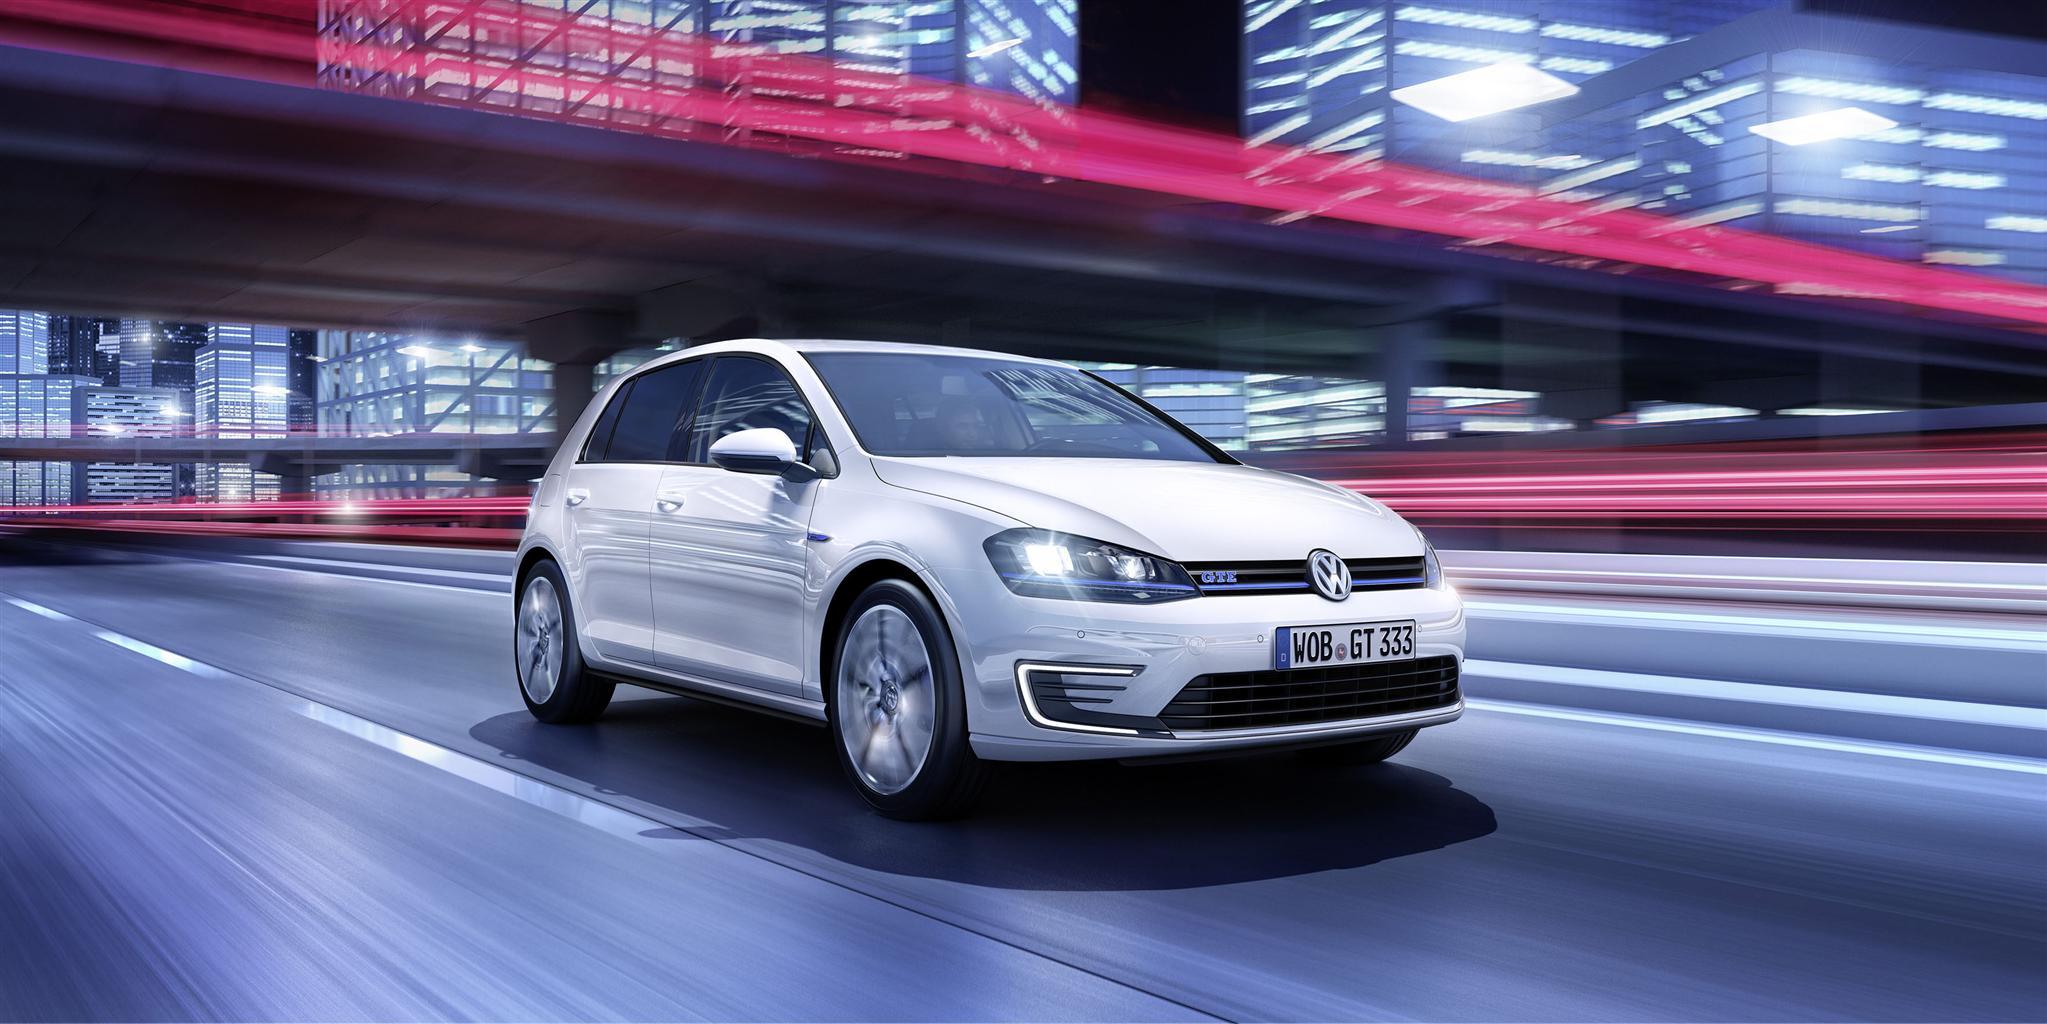 VW Golf GTE anteprima mondiale a Ginevra